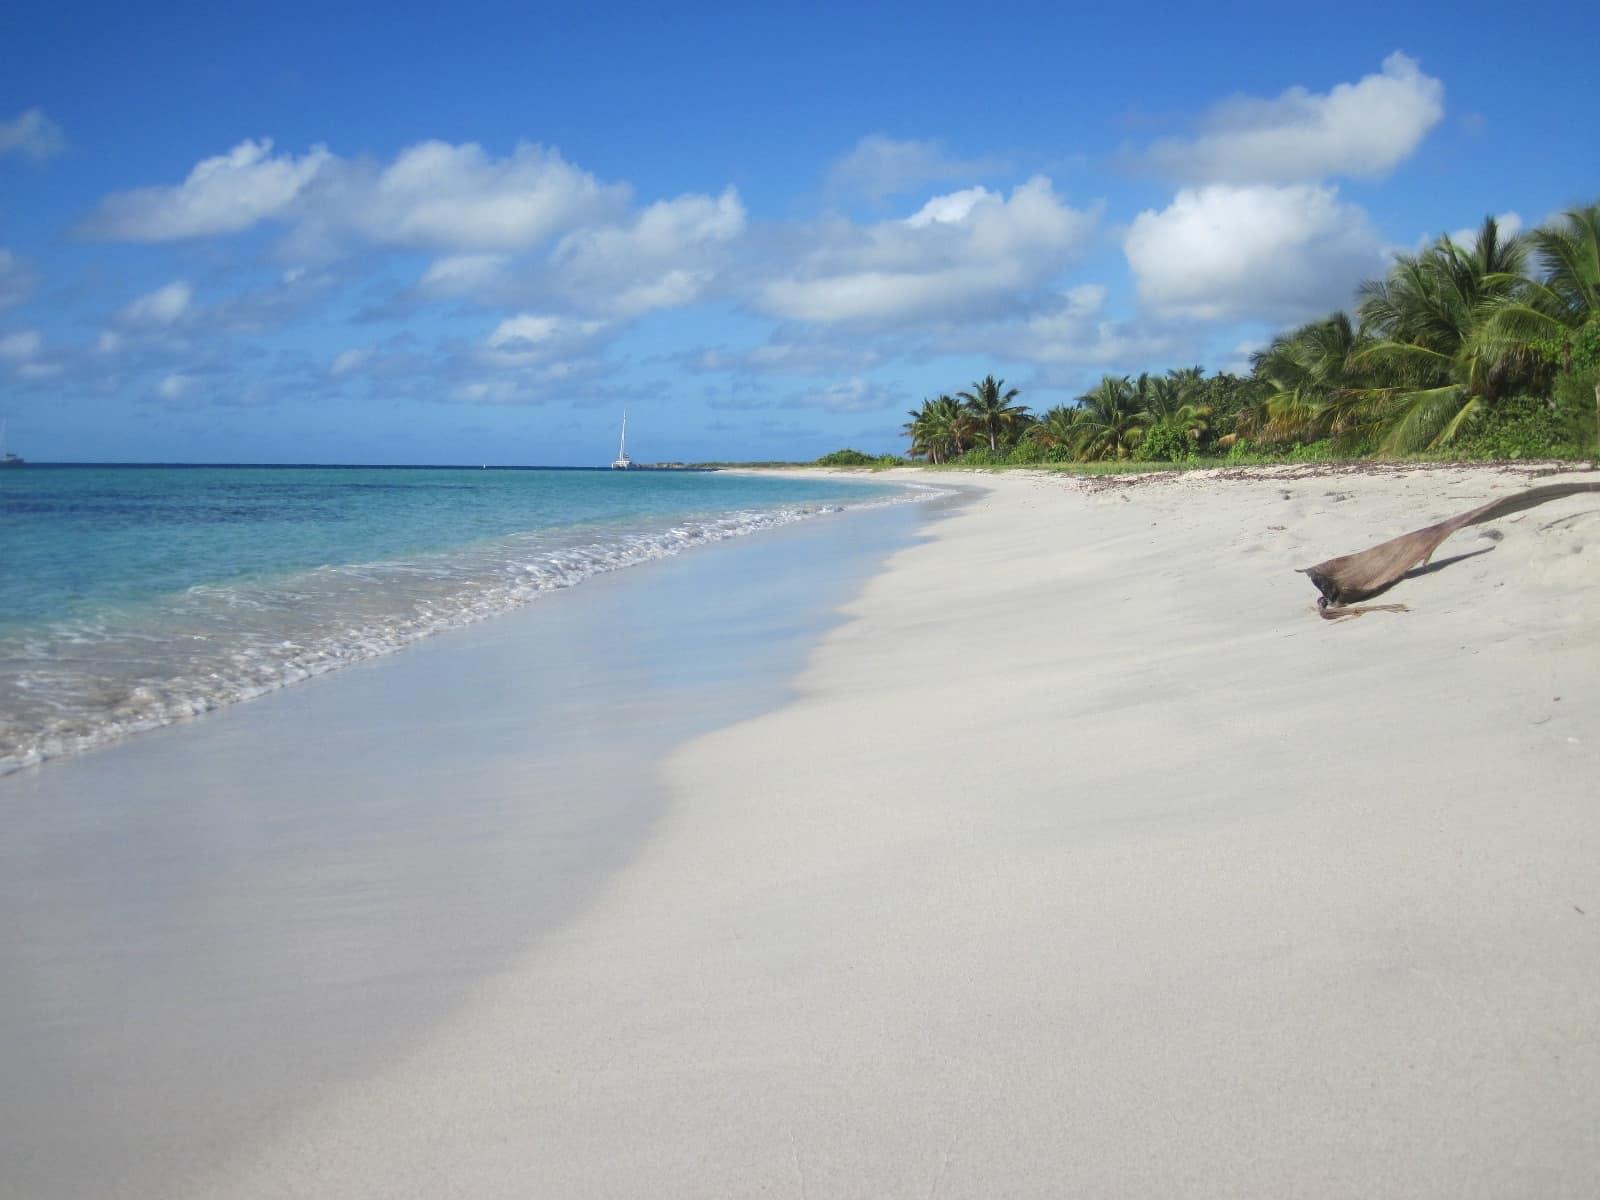 Playa de la chiva o playa azul méxico